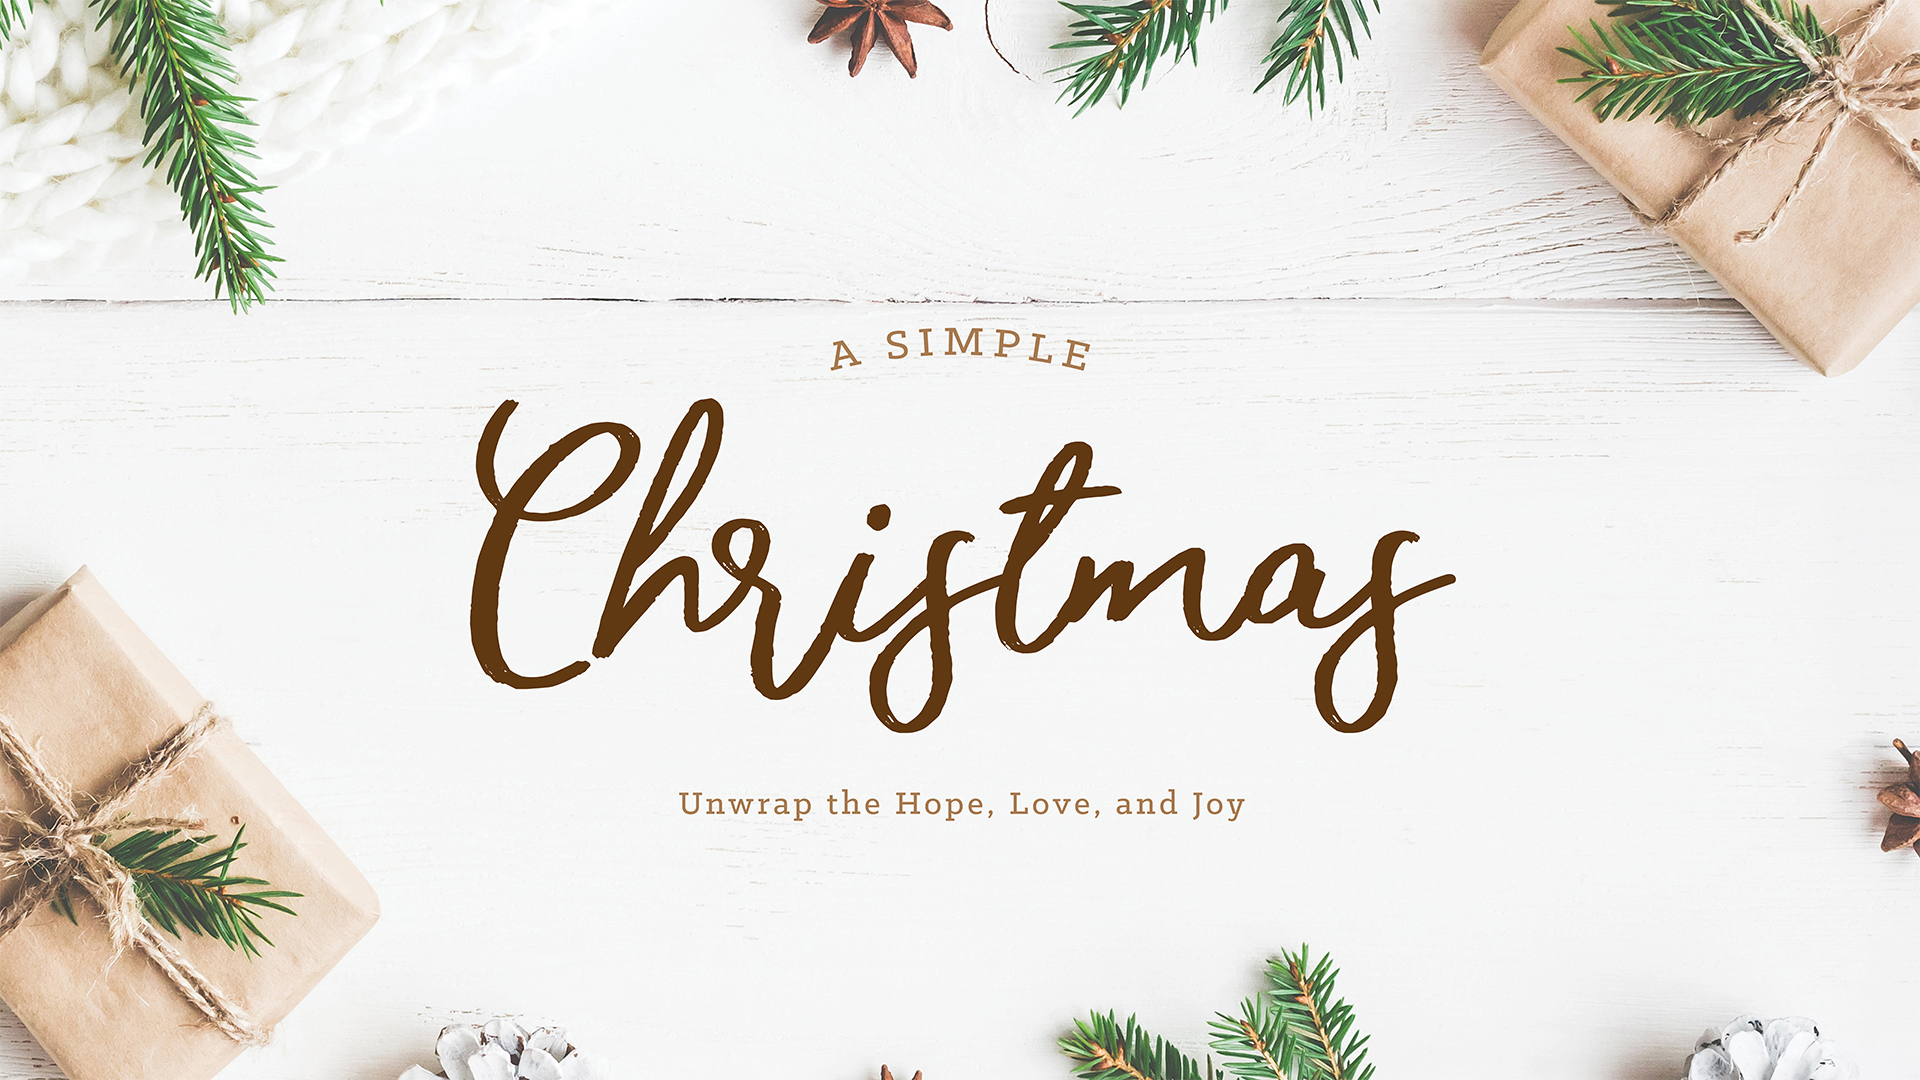 A Simple Christmas  - December 2017